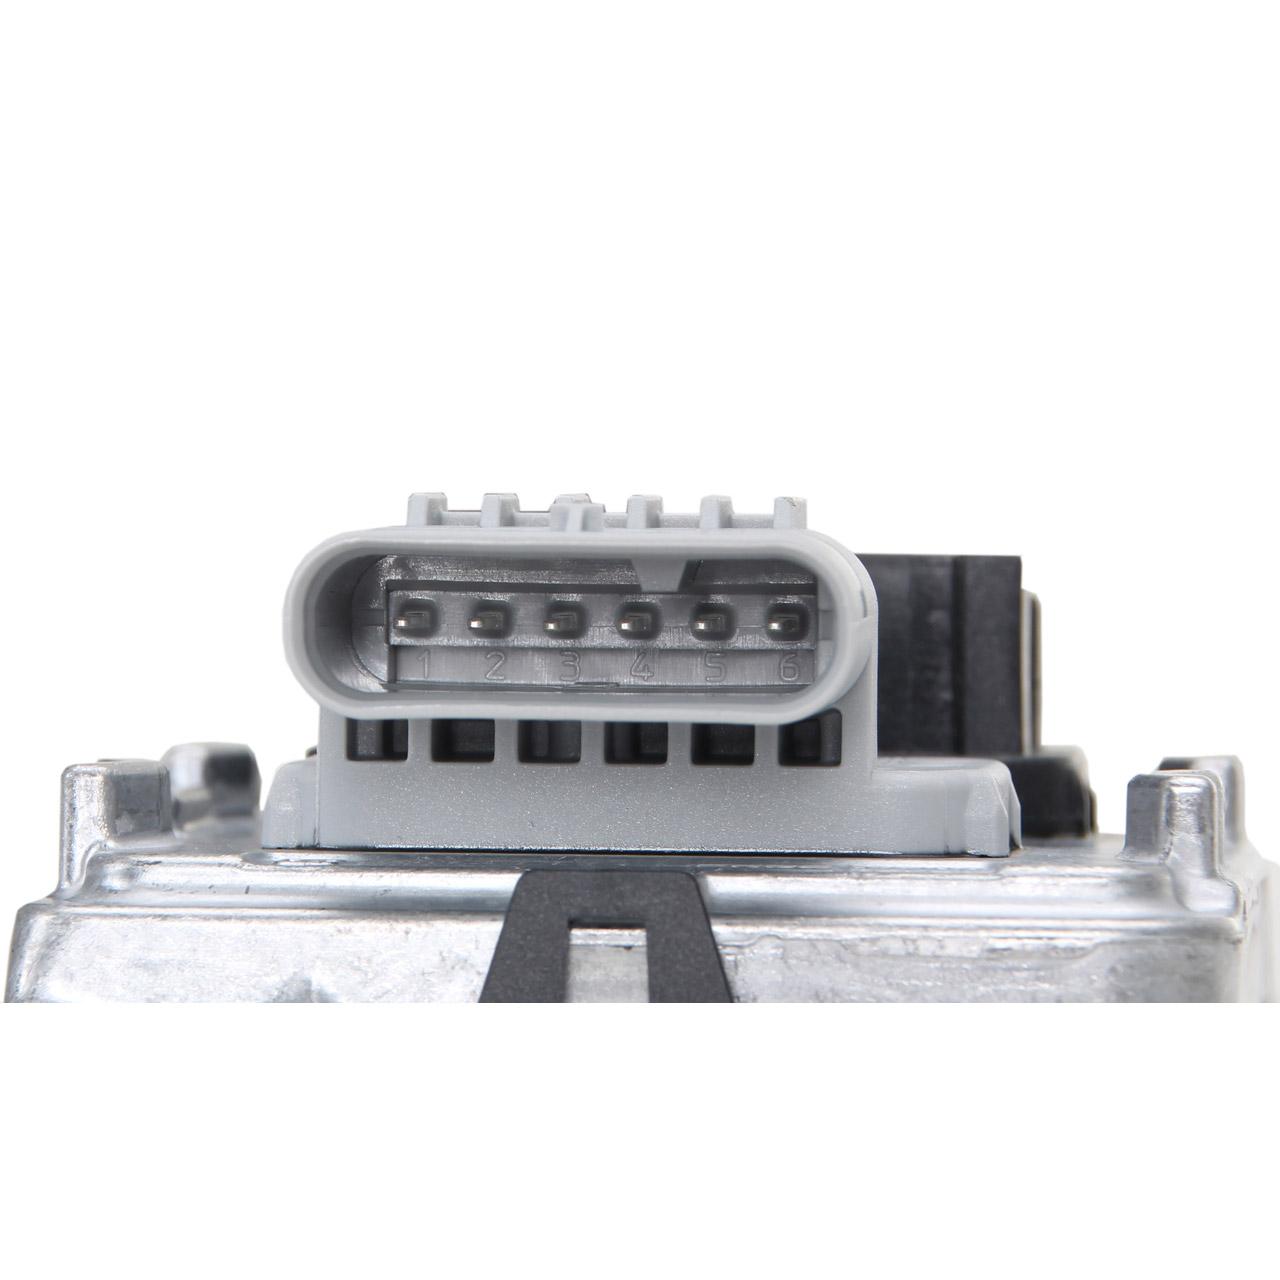 NOx-Sensor Lambdasonde OPEL Insignia A (G09) 2.0 CDTI / 4x4 170 PS 55500320